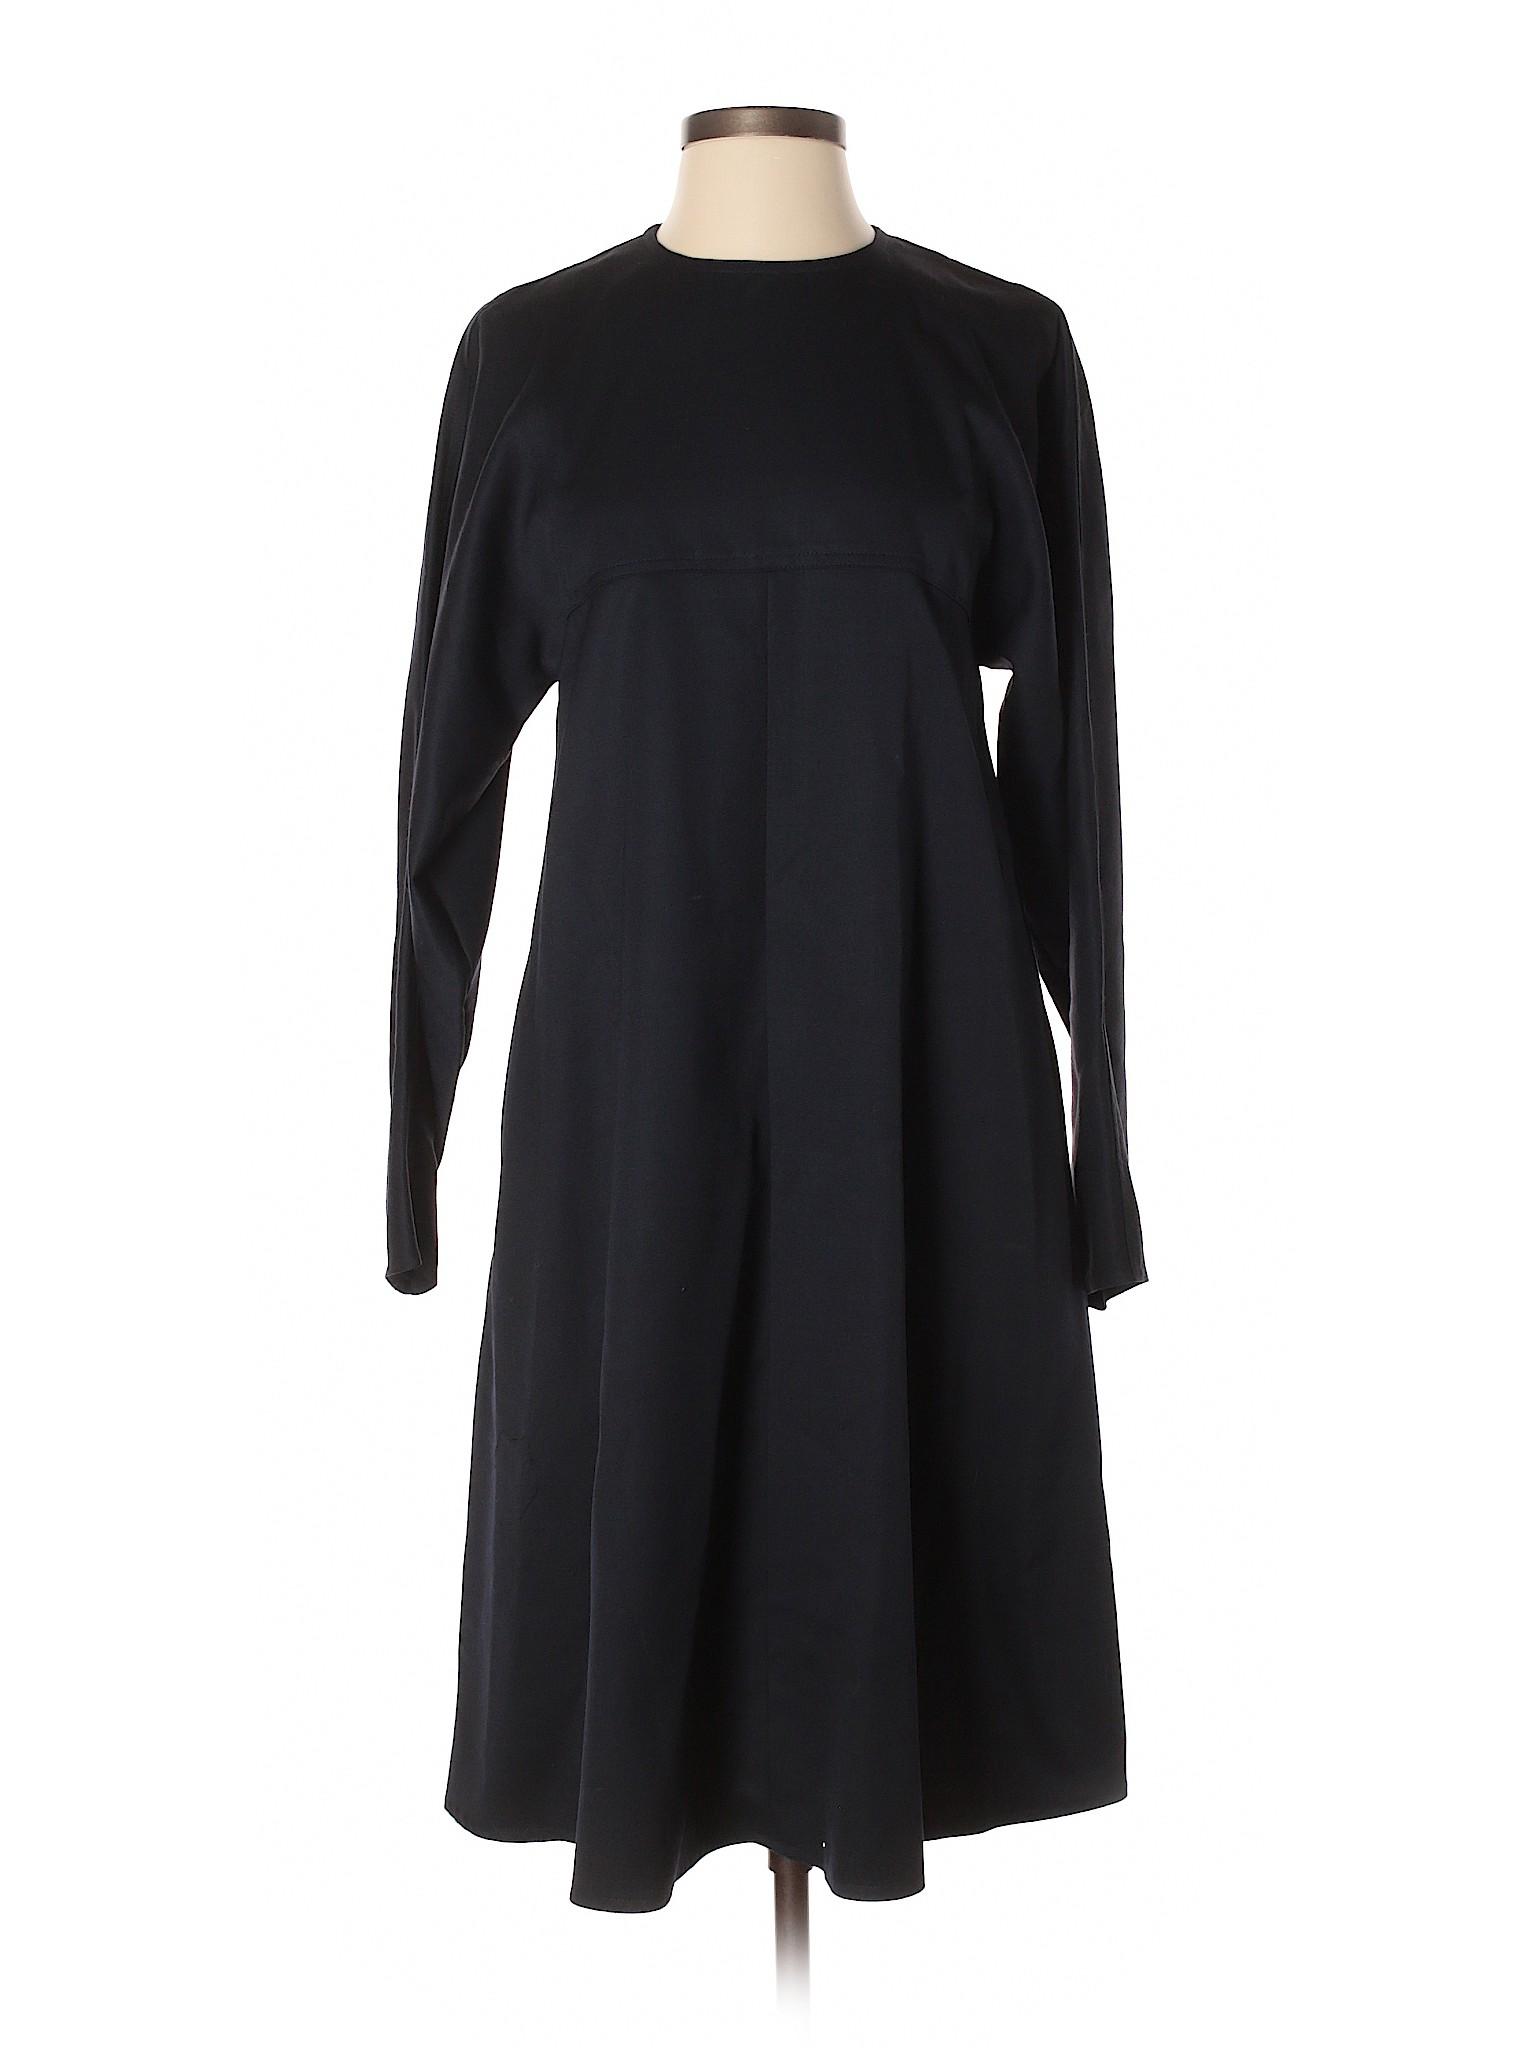 Boutique Benard Dress Casual Harve by Benard Holtzman winter CqC0wIr